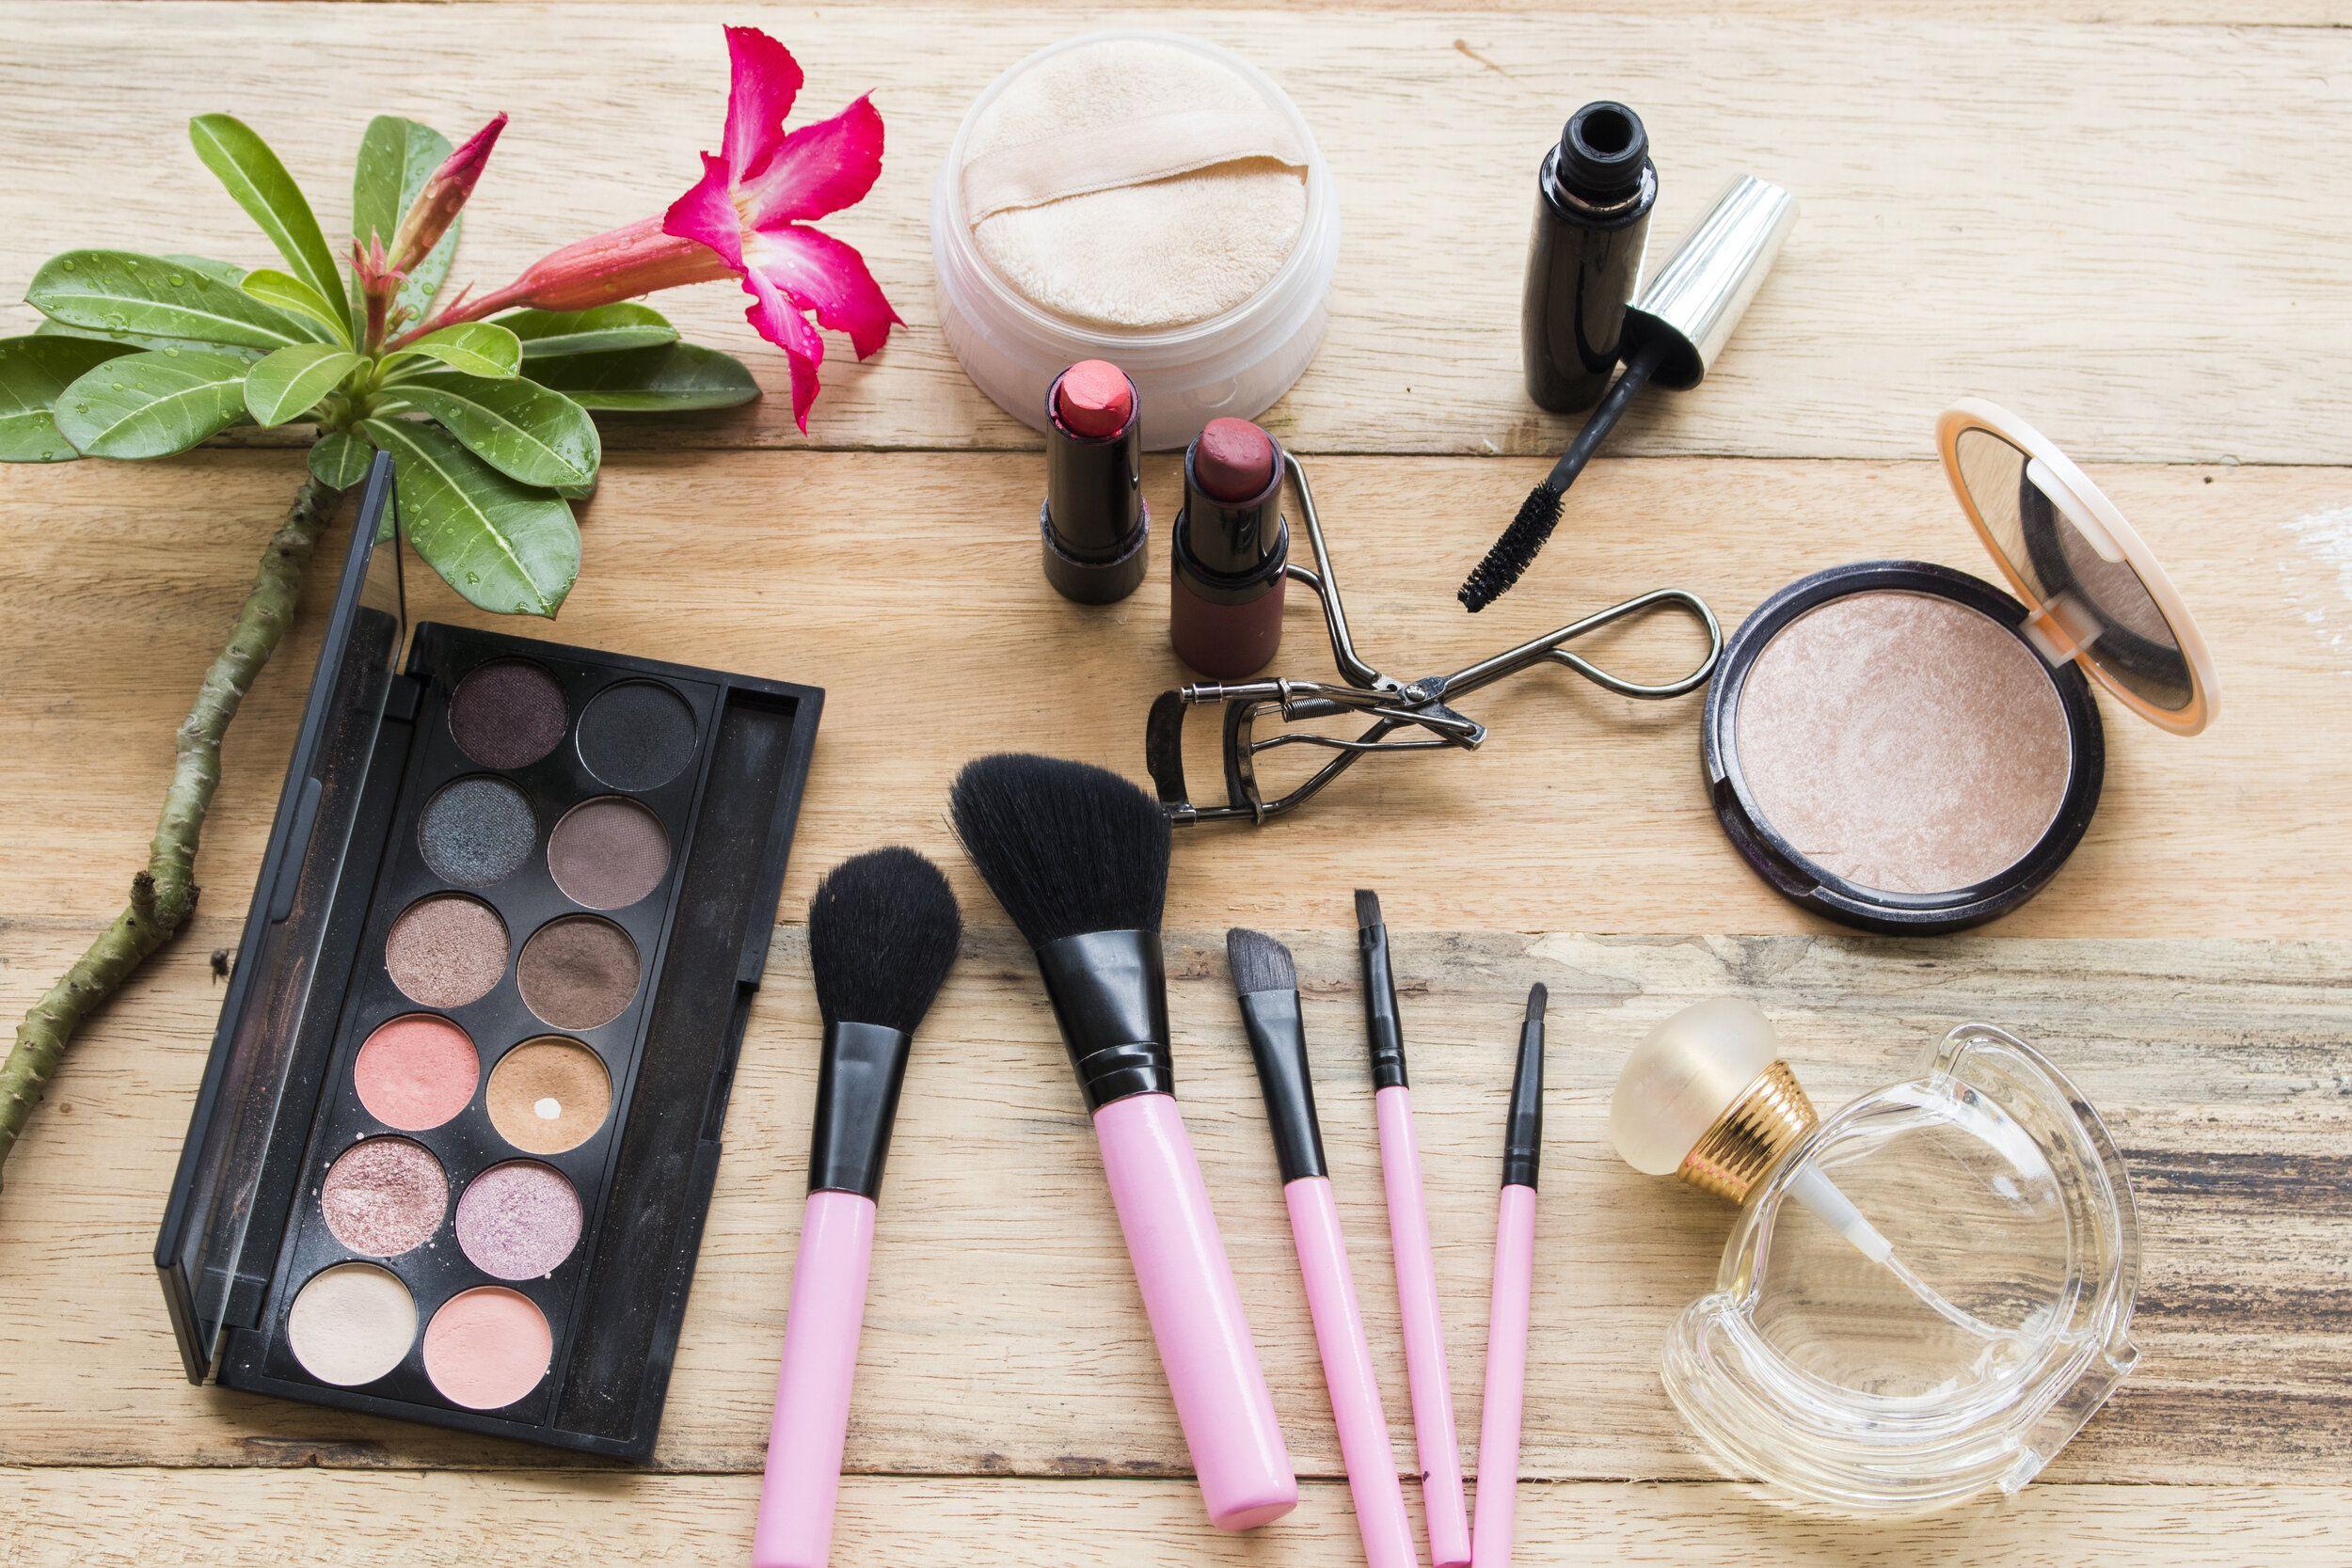 CrueltyFree And Vegan Beauty Tools You Need Vegan